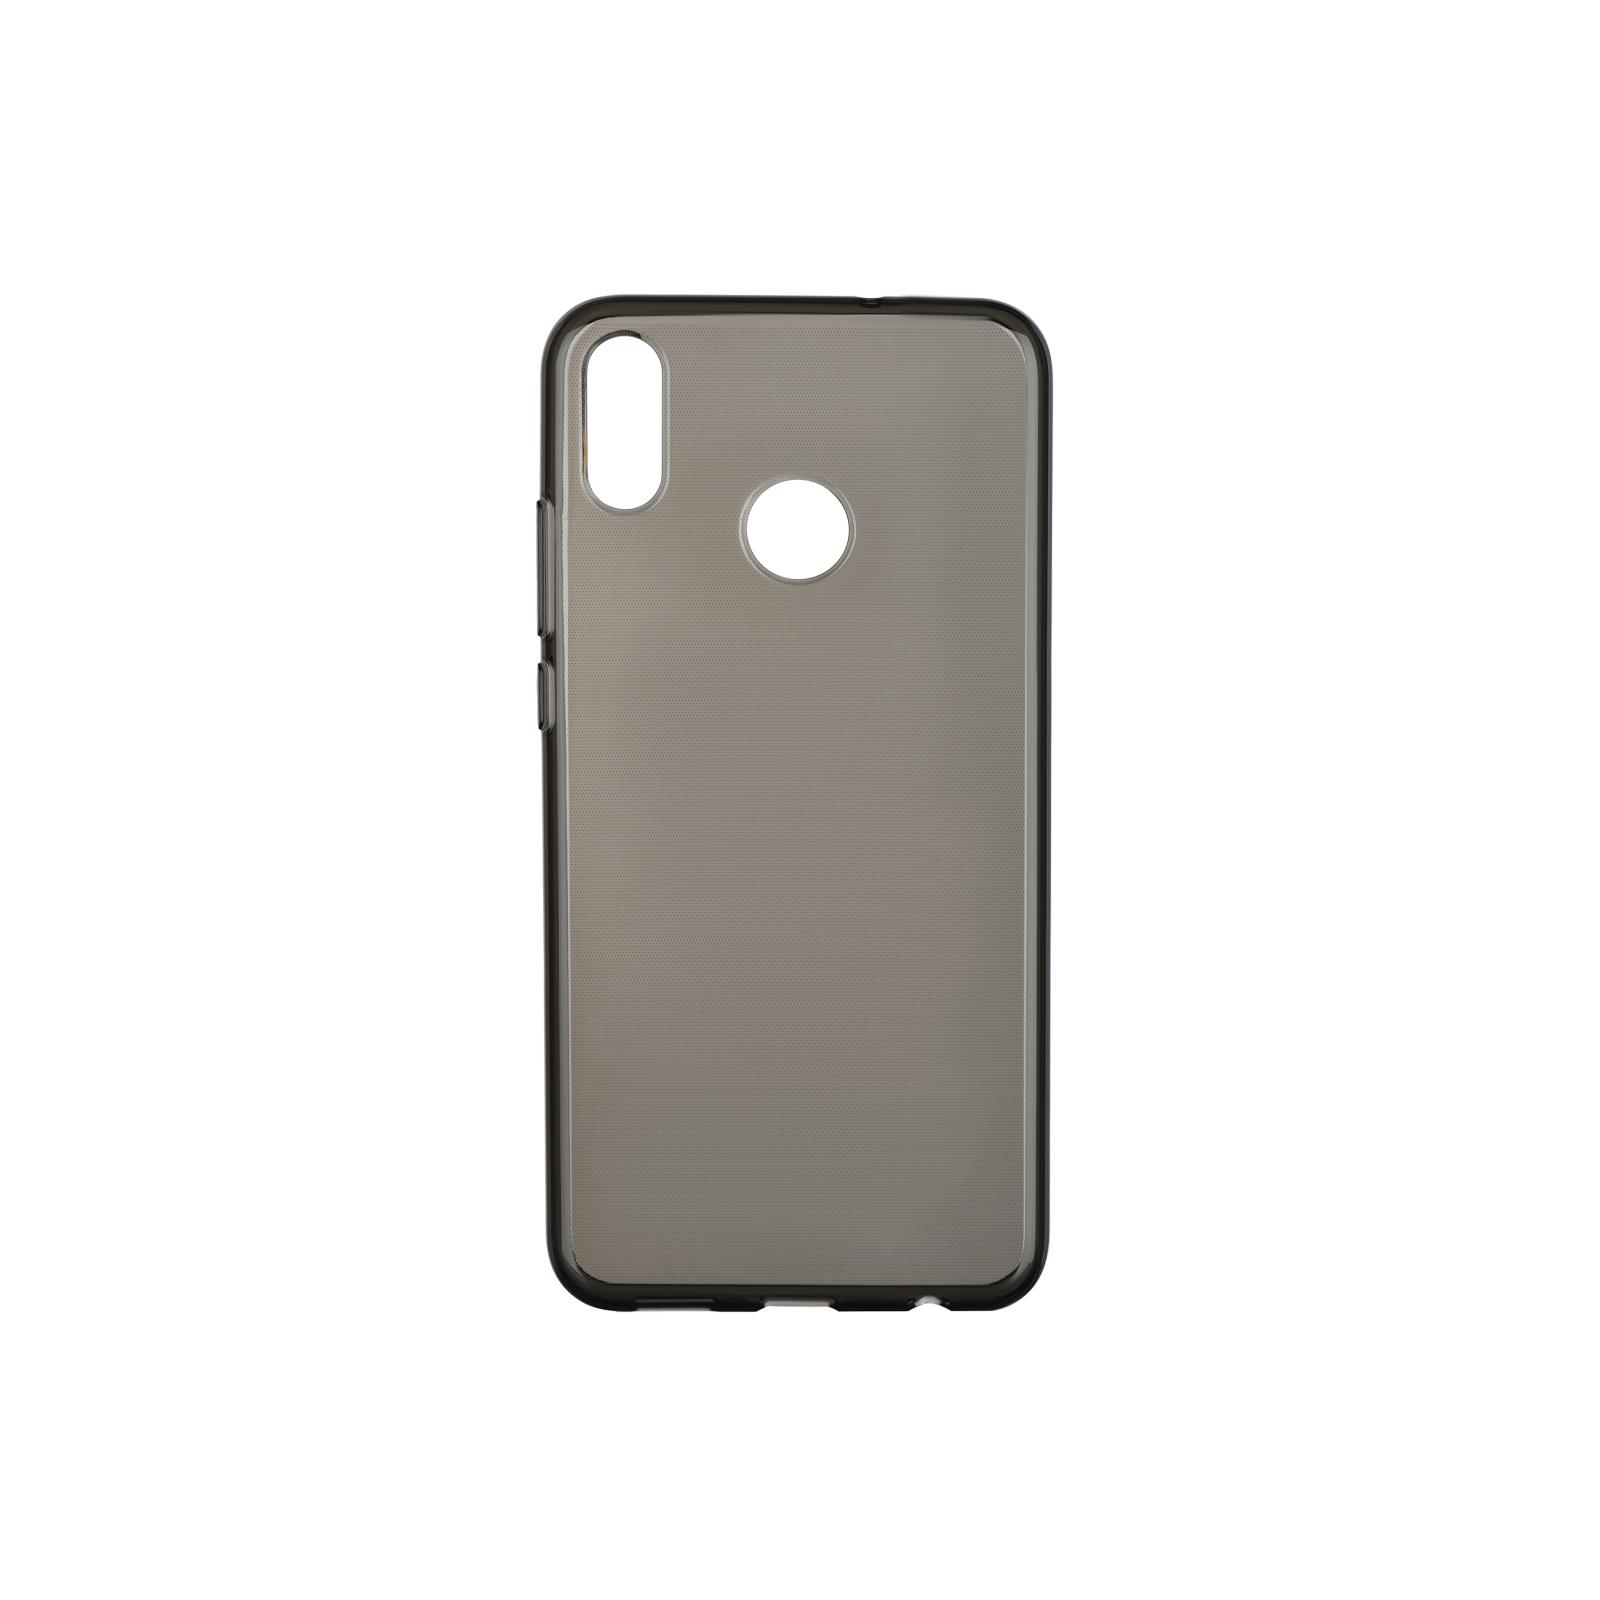 240faee6a8b66 Чехол для моб. телефона 2E Huawei Honor 8X, Crystal , Black (2E-H-8X ...